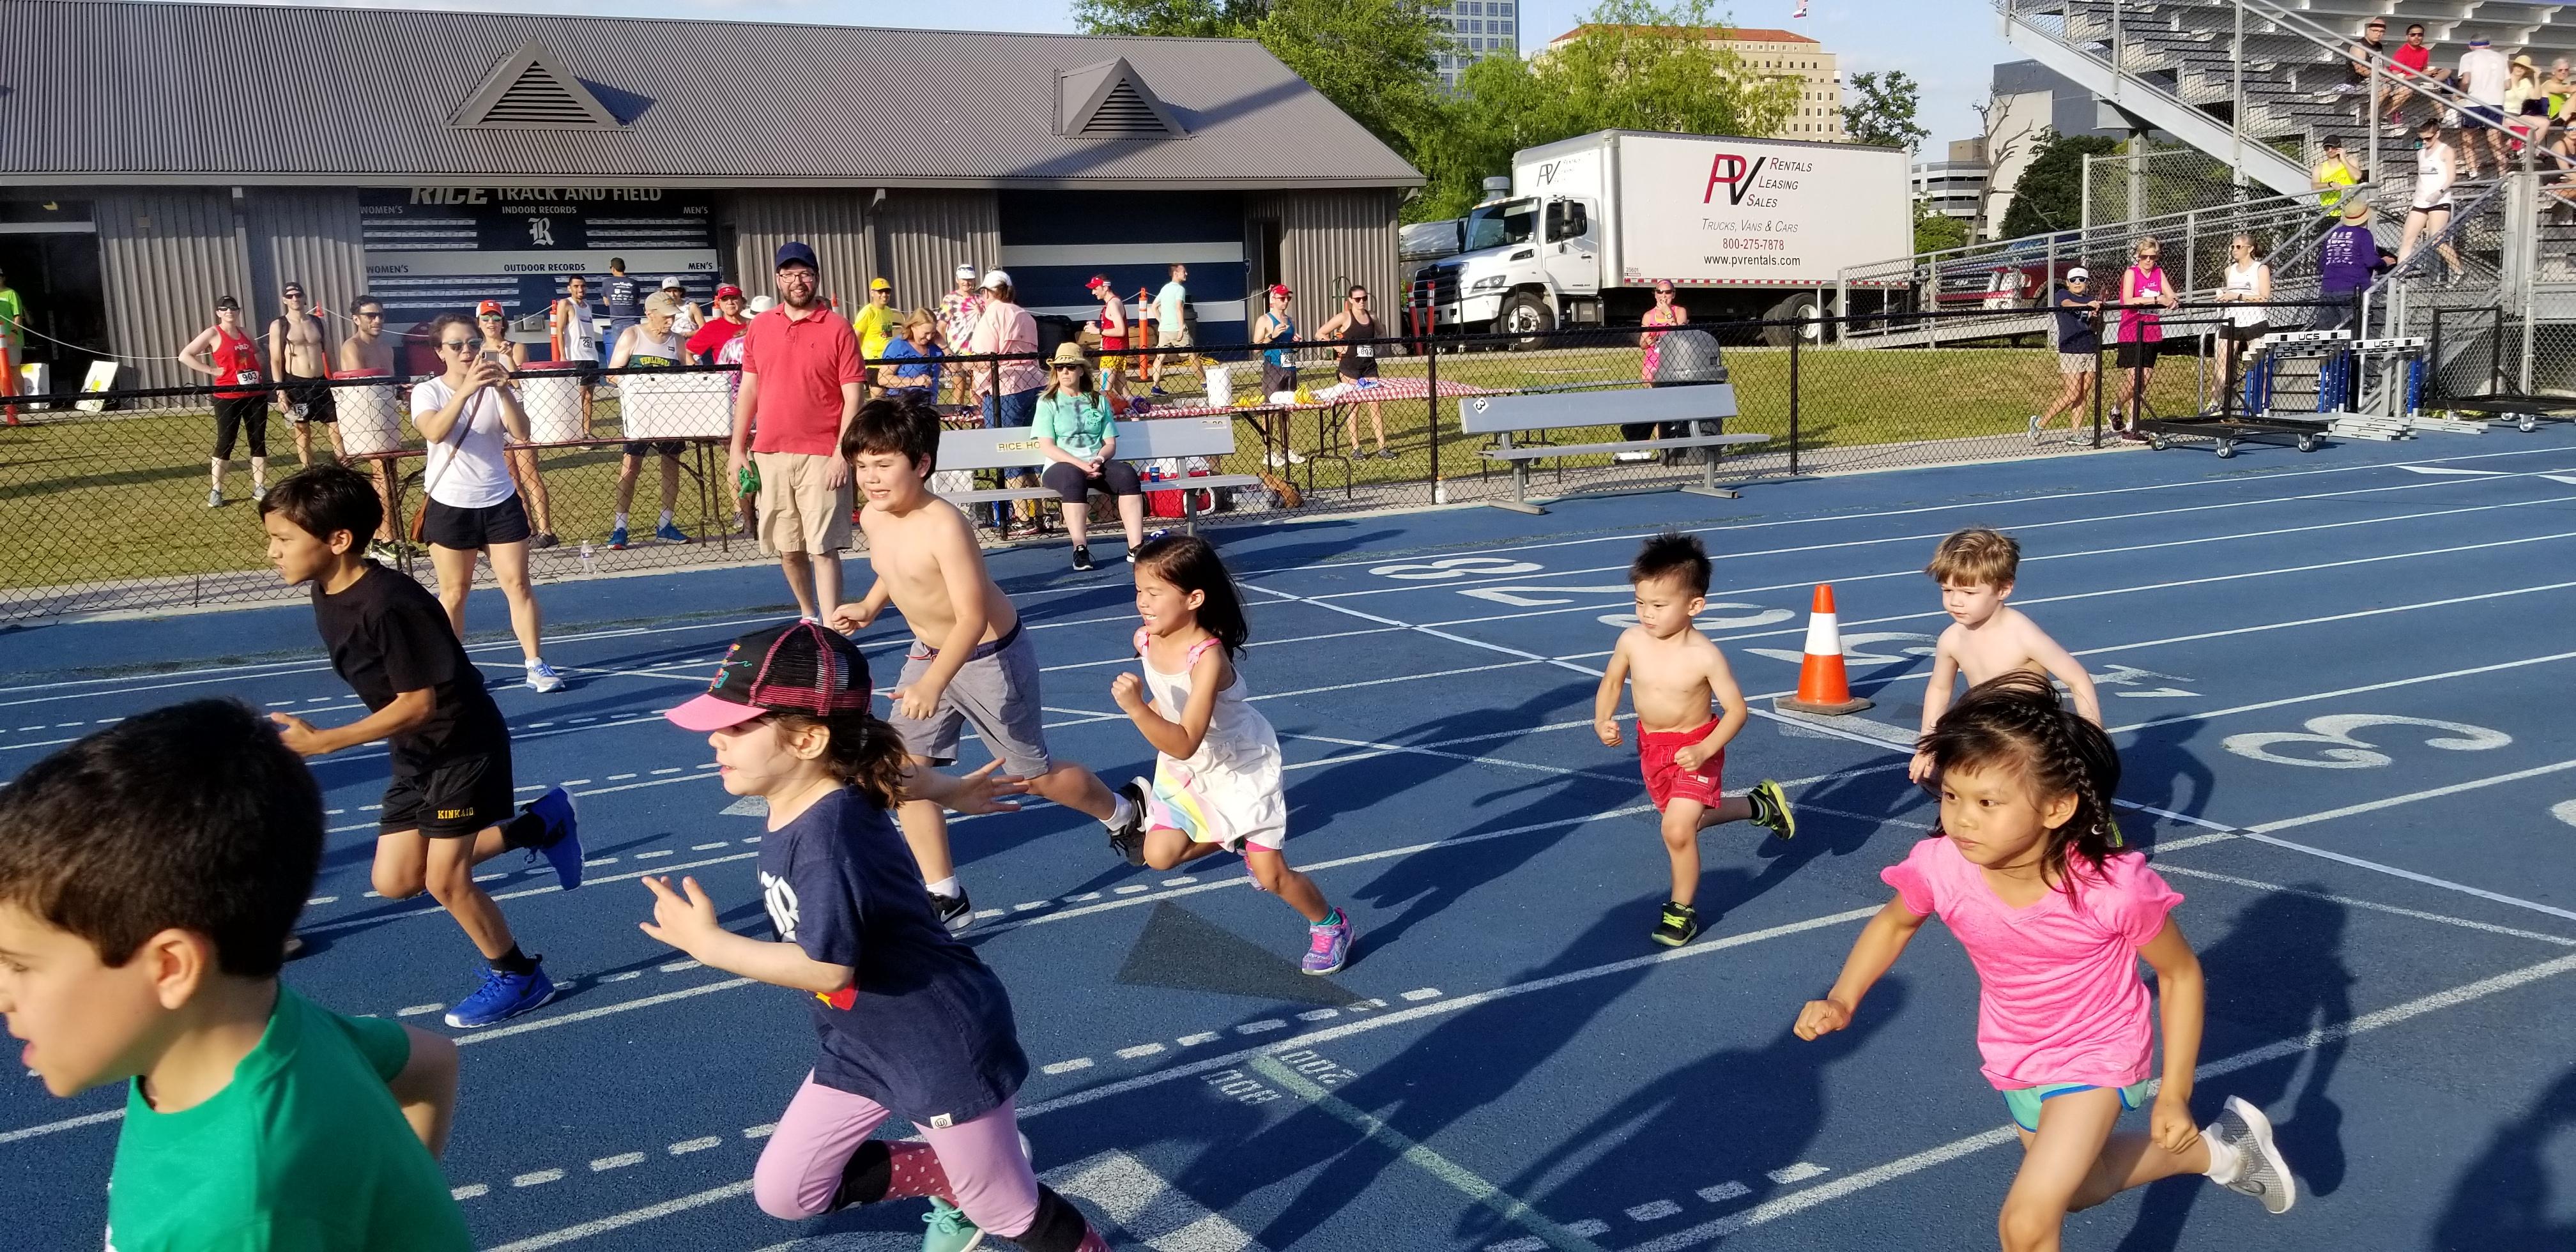 LP Run 2019 Kids Race Underway